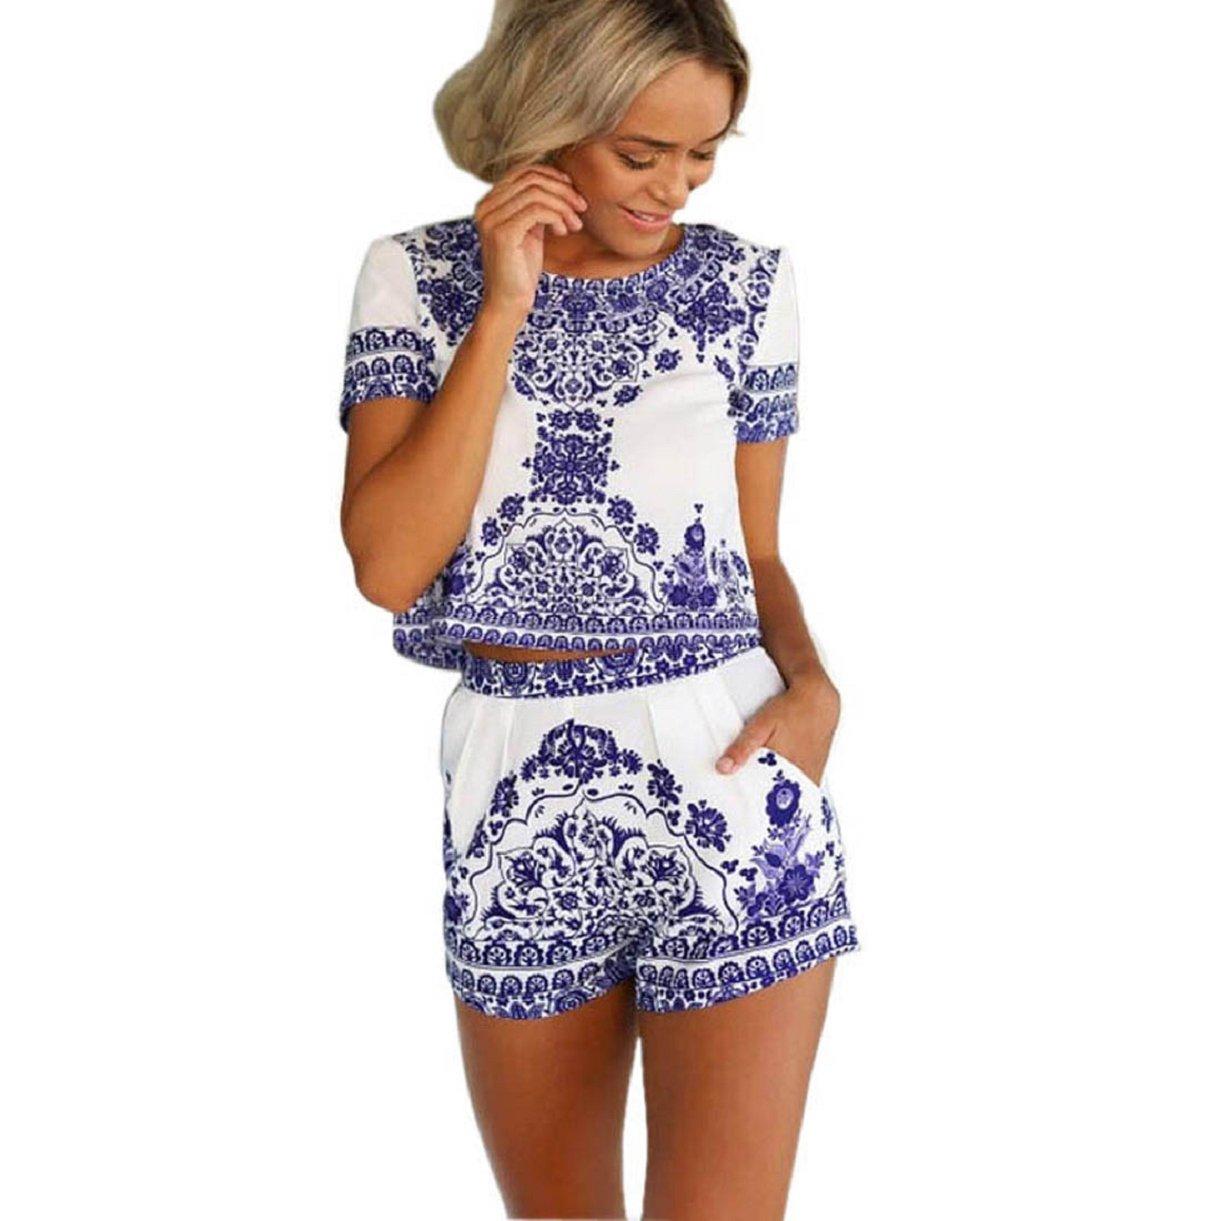 MokingWomen Blue and White Short Sleeve Blouese Shirt and Shorts Short Pants